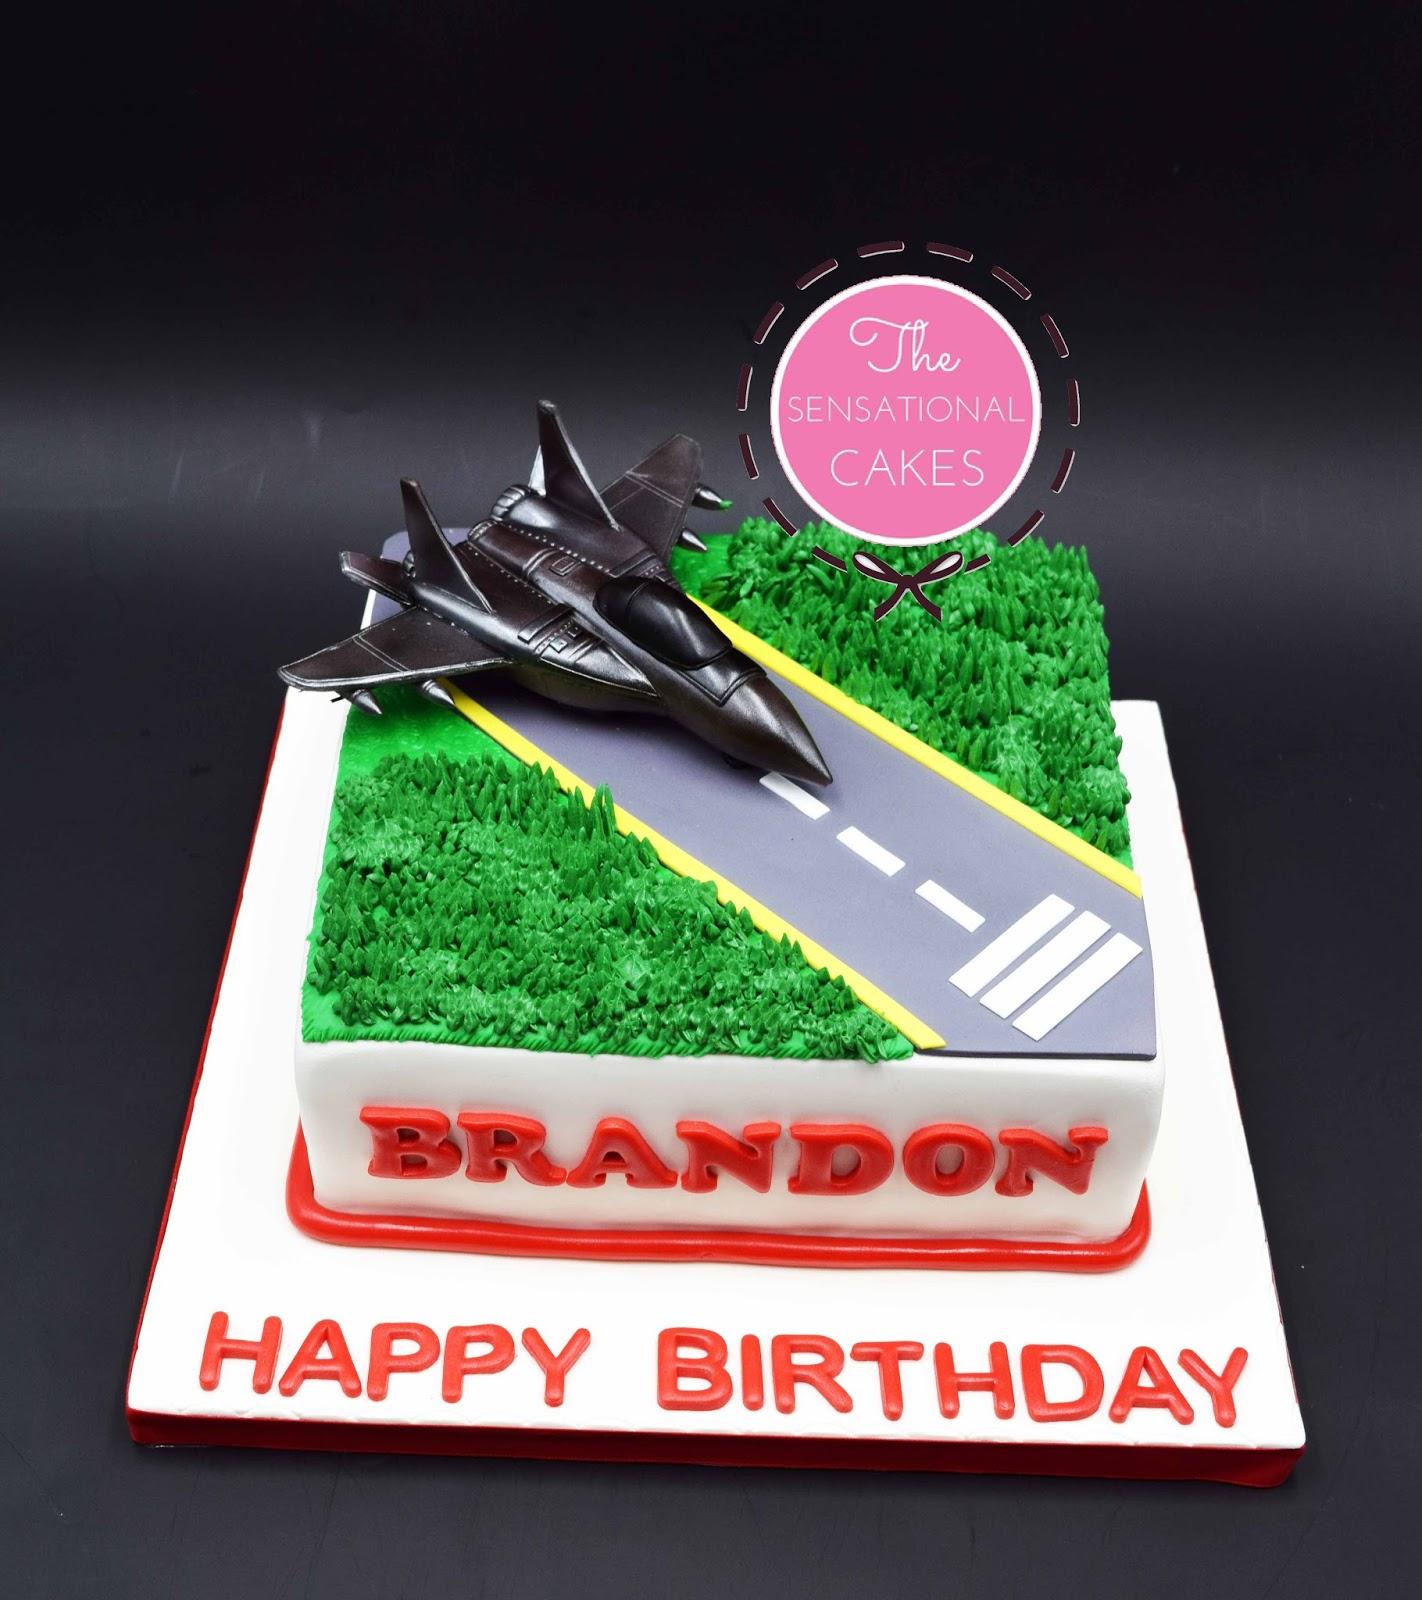 The Sensational Cakes F16 Fighter Plane Cake Singapore Birthday